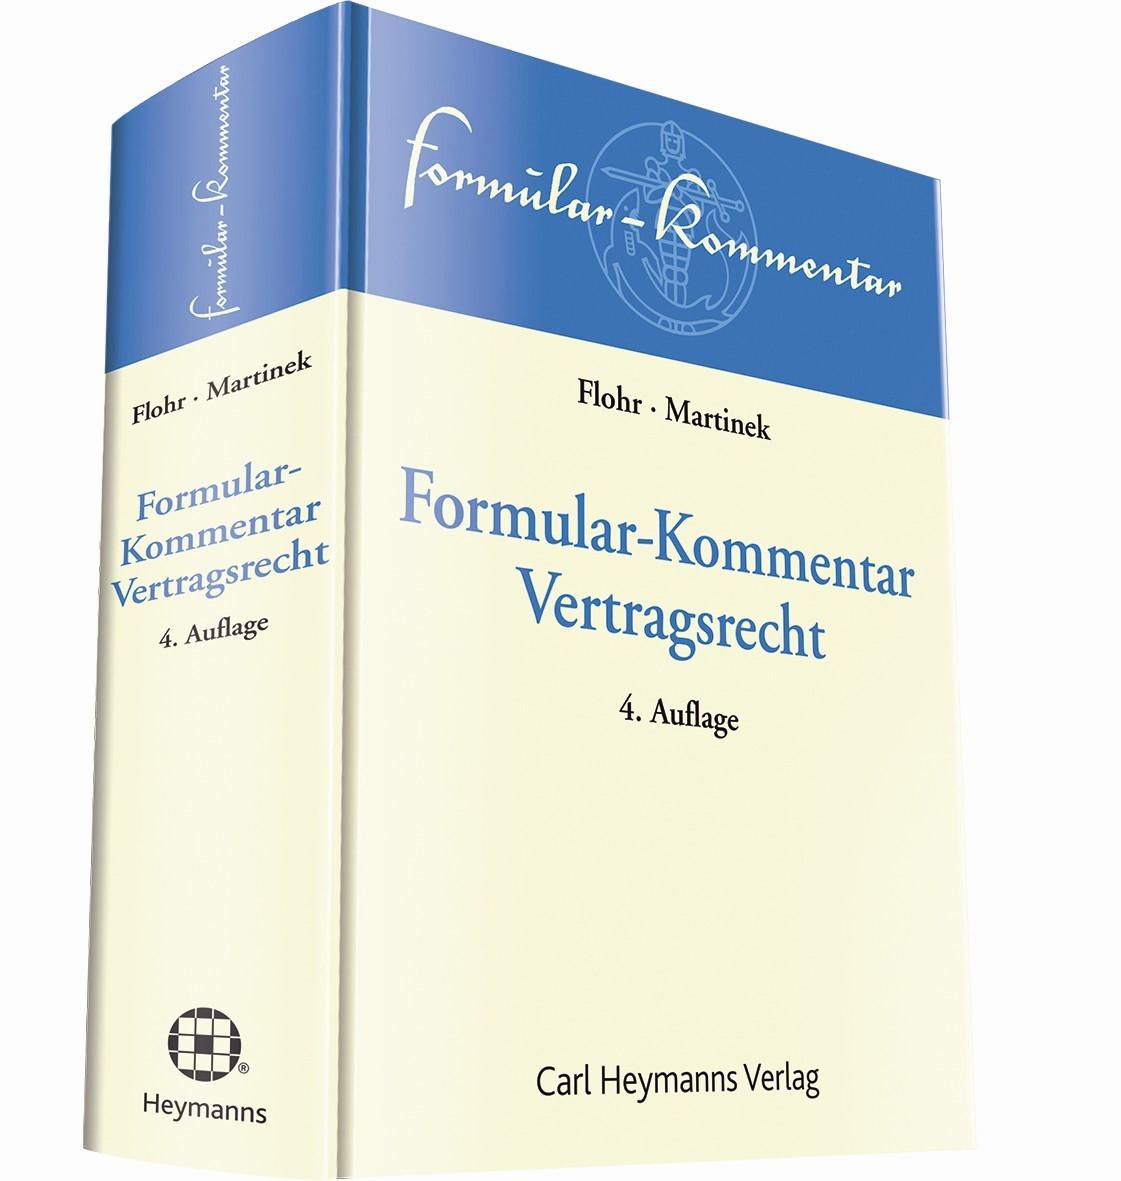 Formular-Kommentar Vertragsrecht | Flohr / Martinek (Hrsg.) | 4. Auflage, 2019 | Buch (Cover)